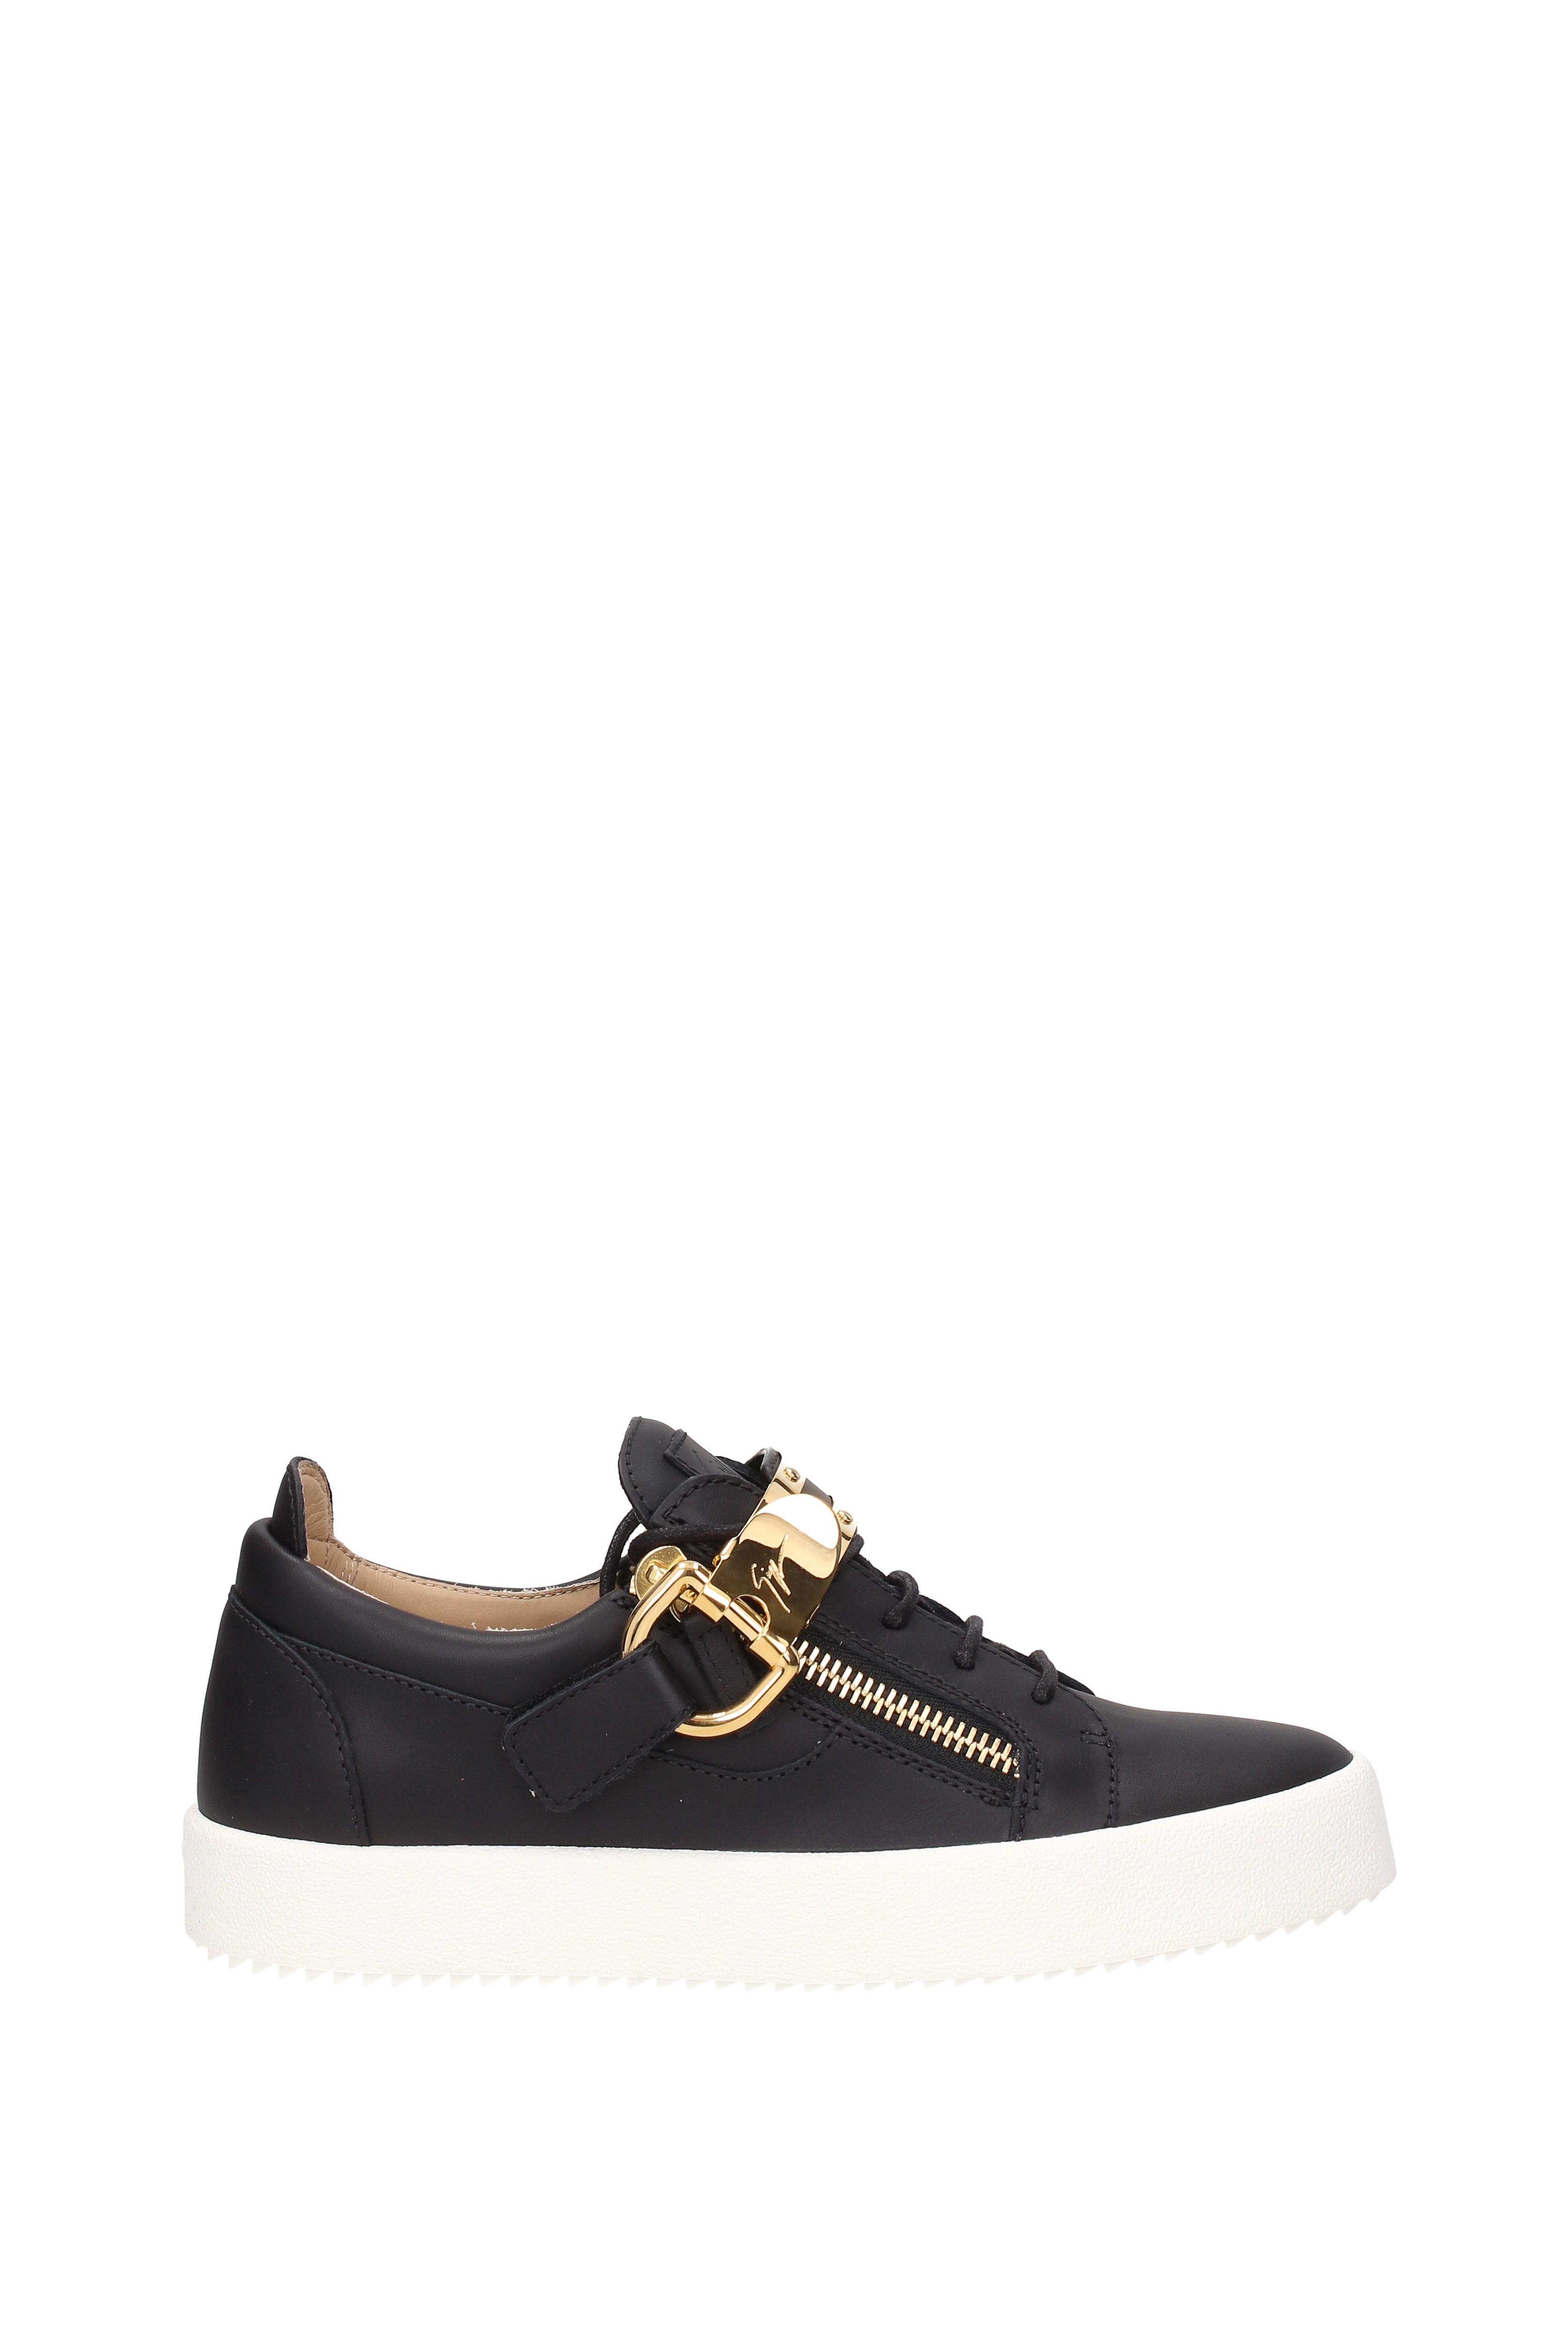 May London Leather SneakersGiuseppe Zanotti qDzfsBdQ